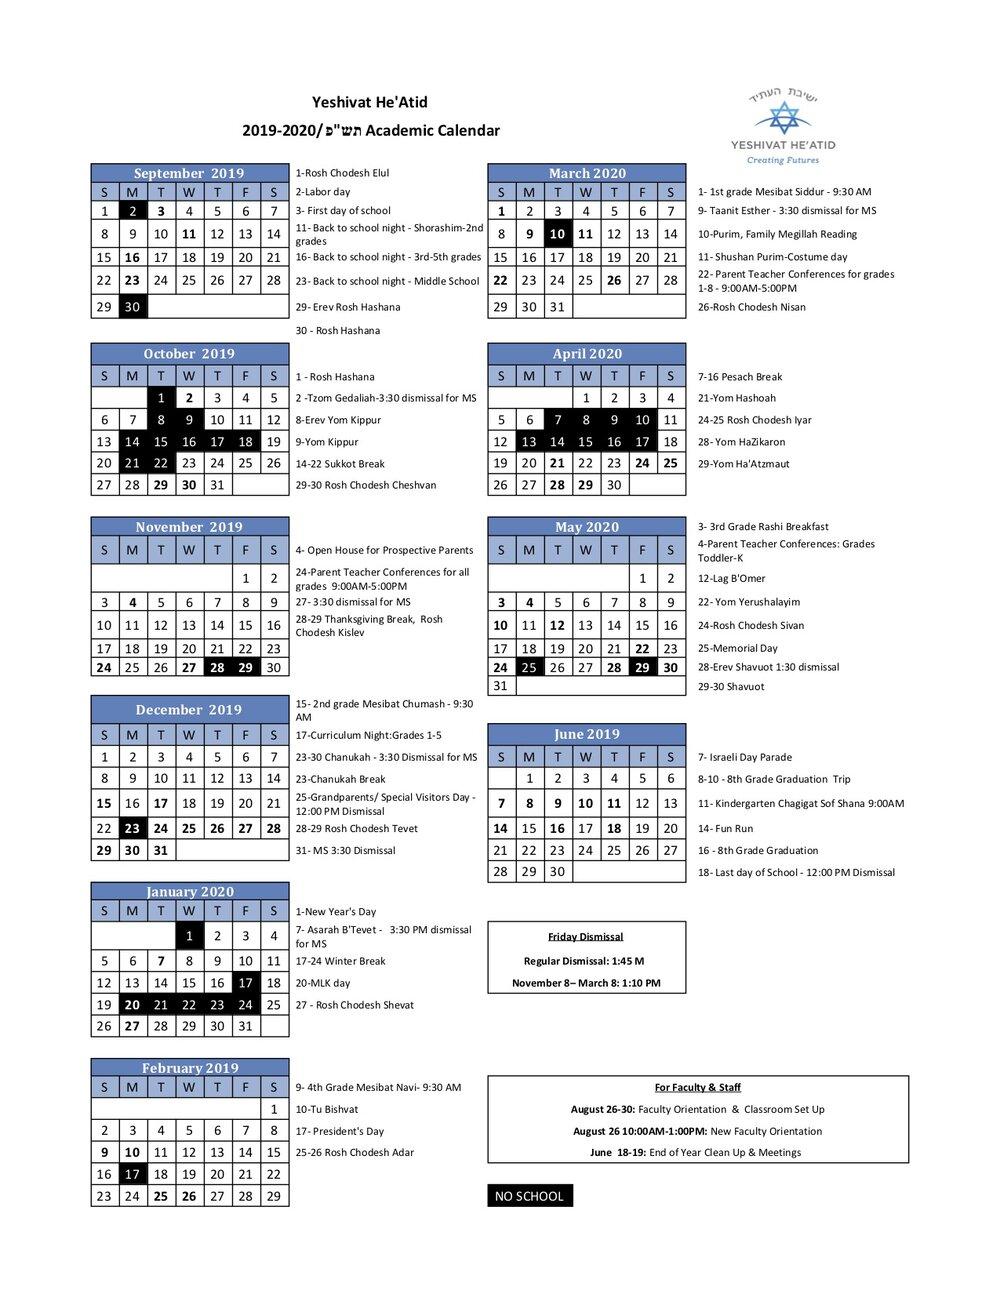 School Calendar — Yeshivat He'atid For Rye Country Day School Calendar 2021